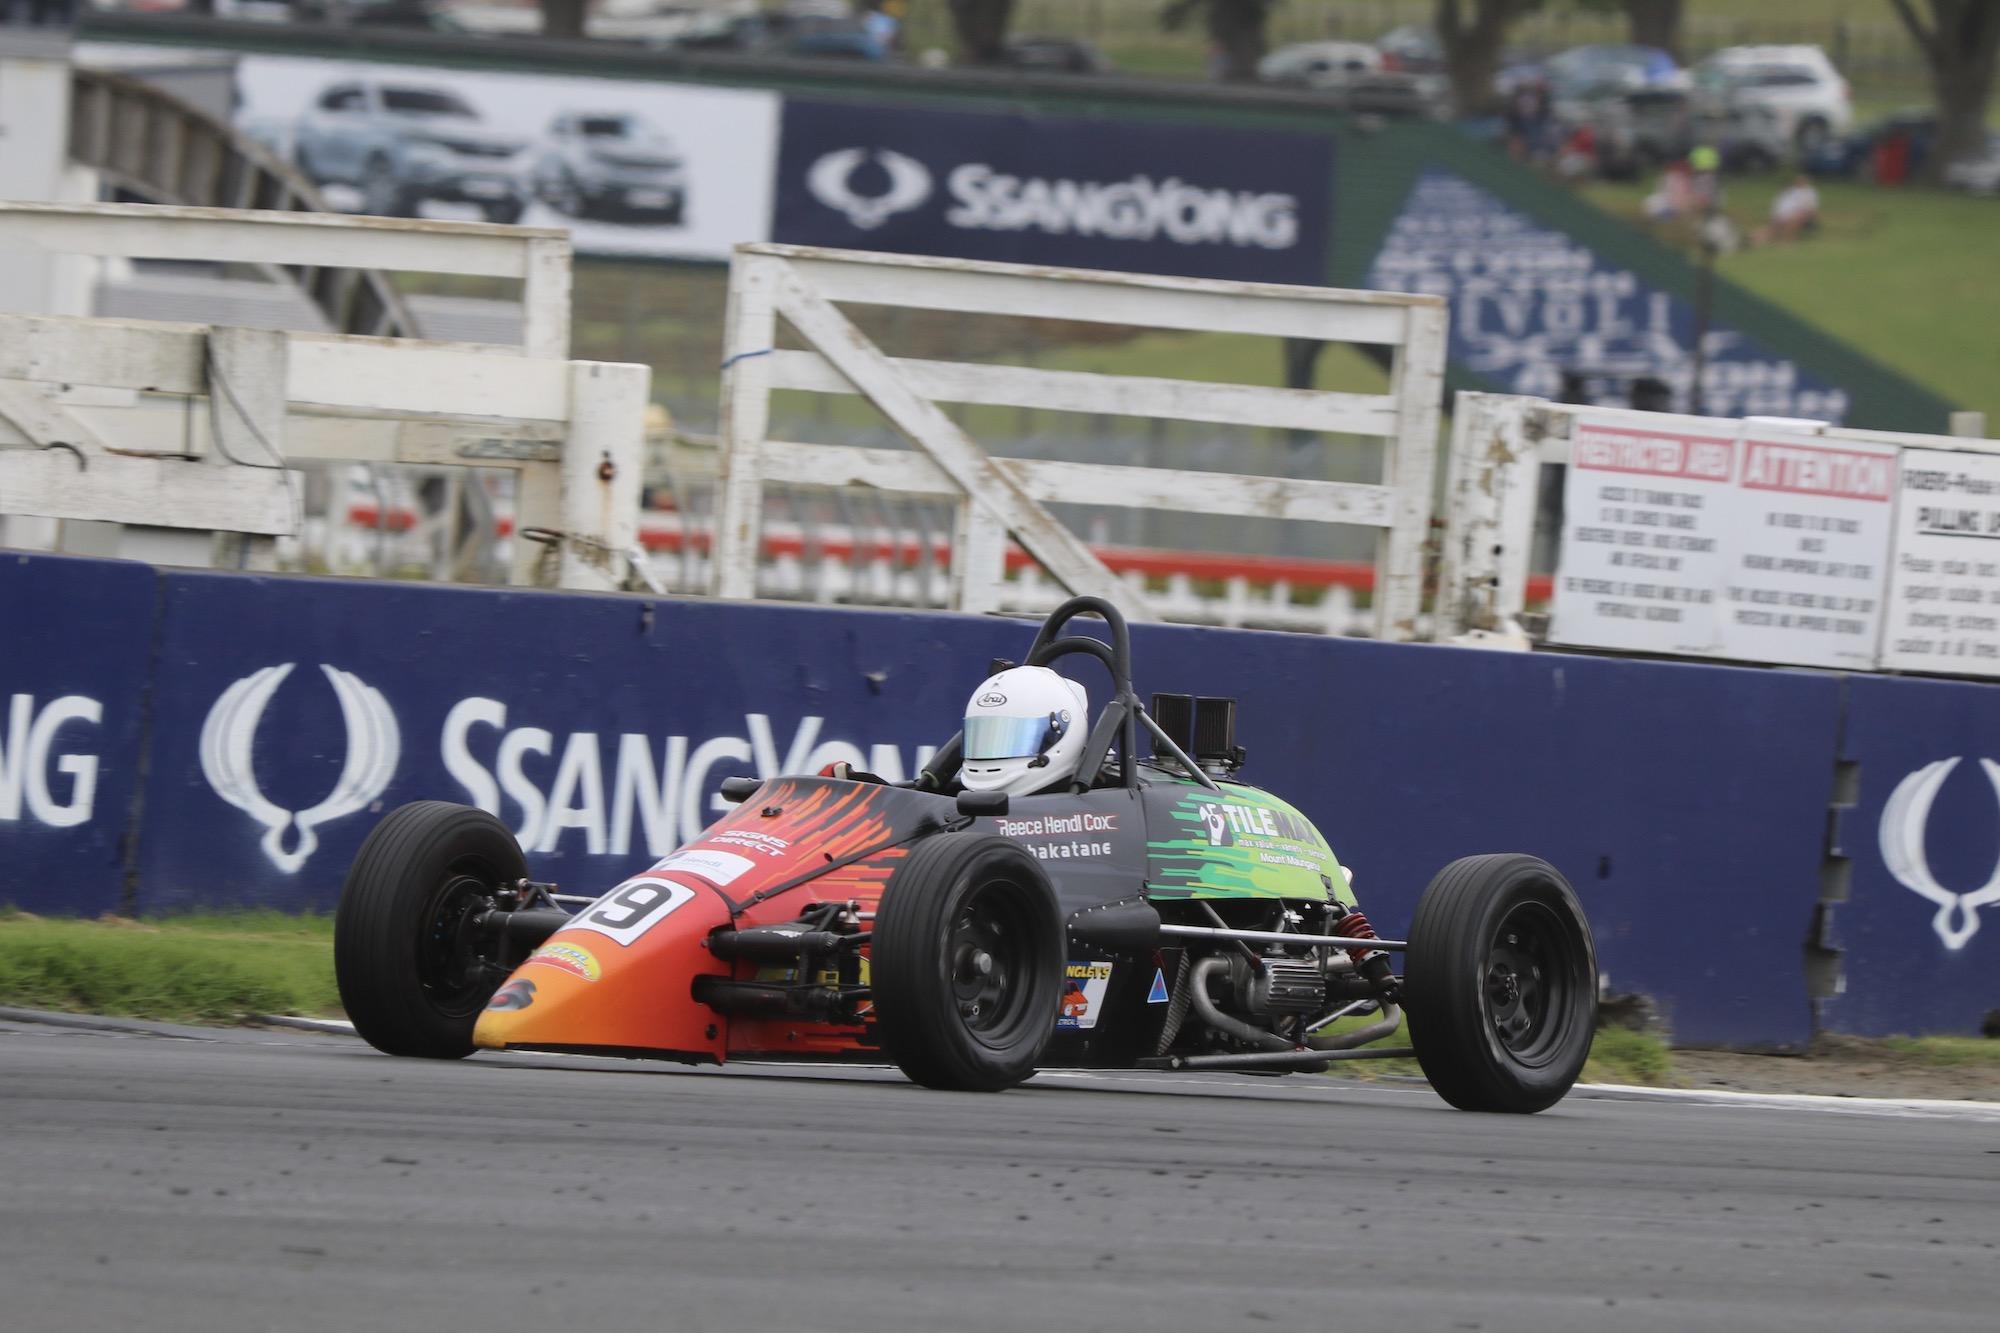 Hendl-Cox Wins Pukekohe